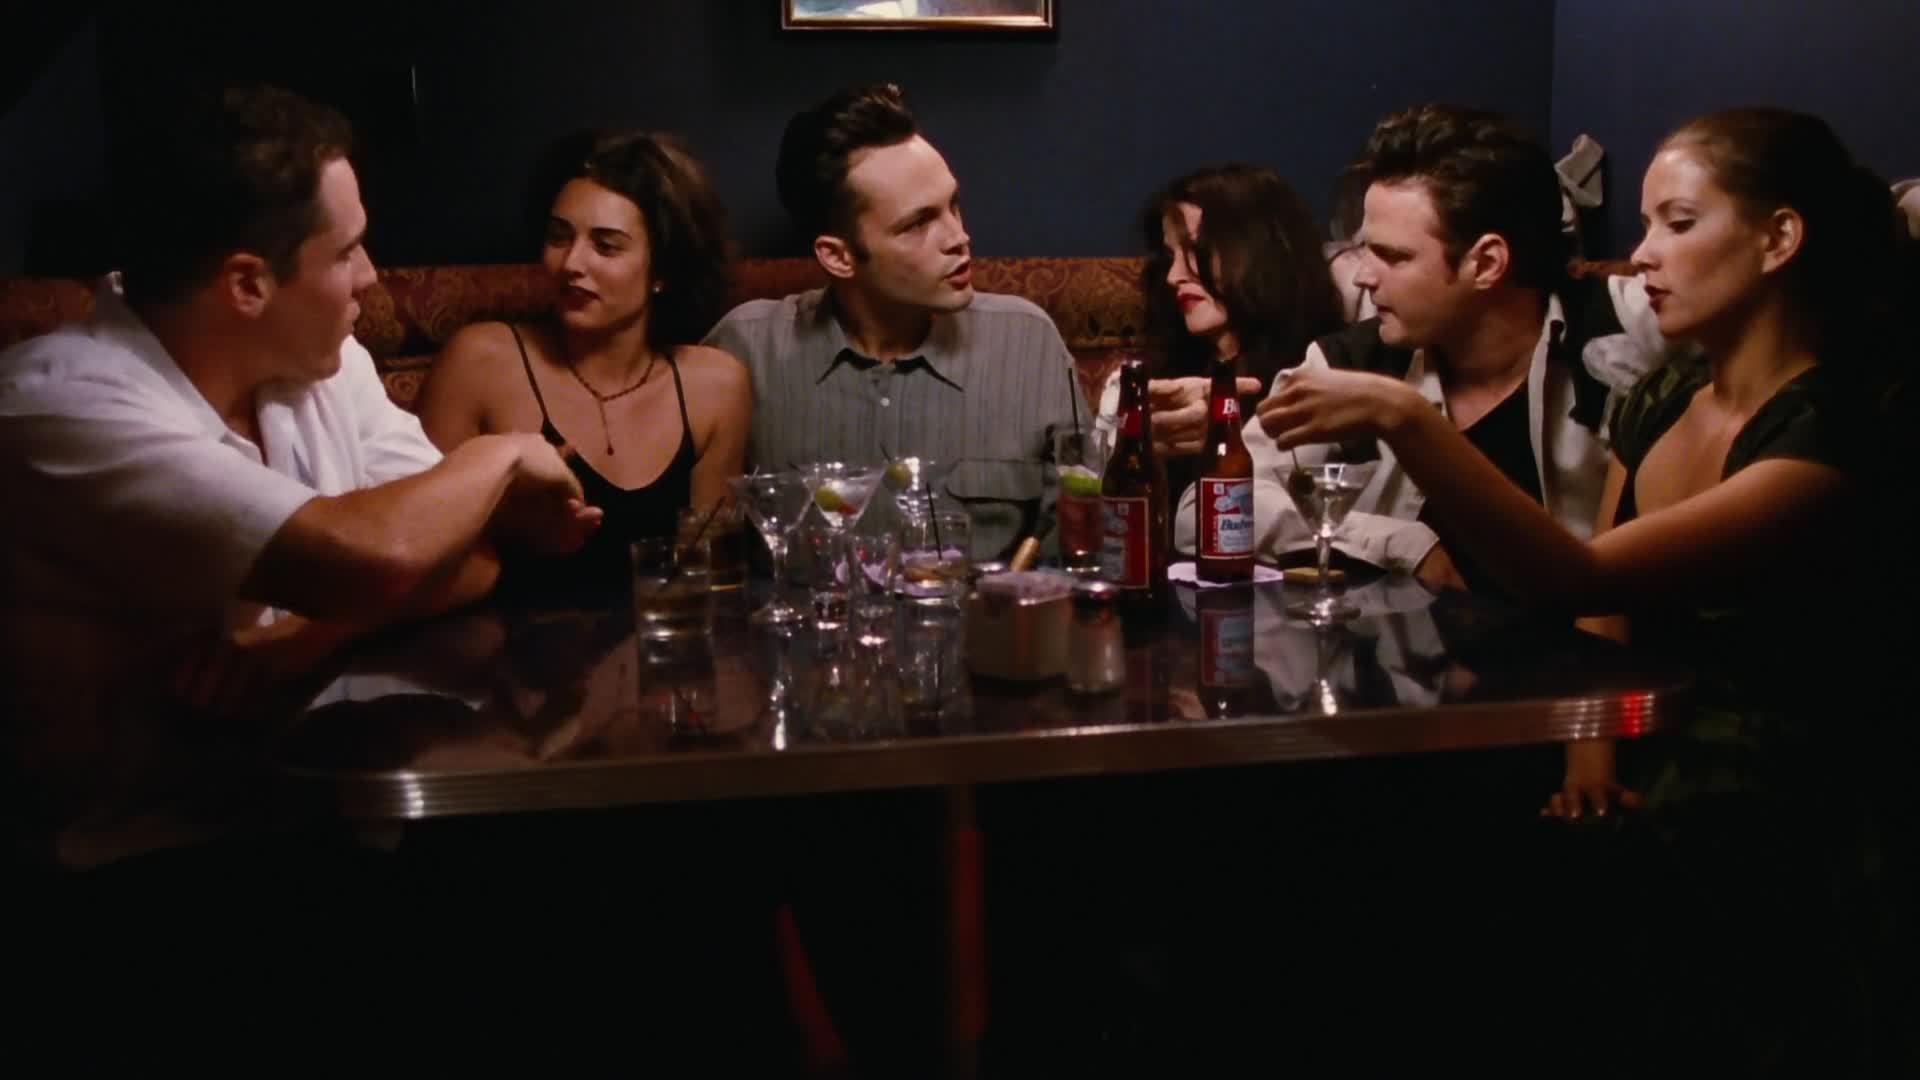 Swingers - Nathans Movie Challenge, Week 15